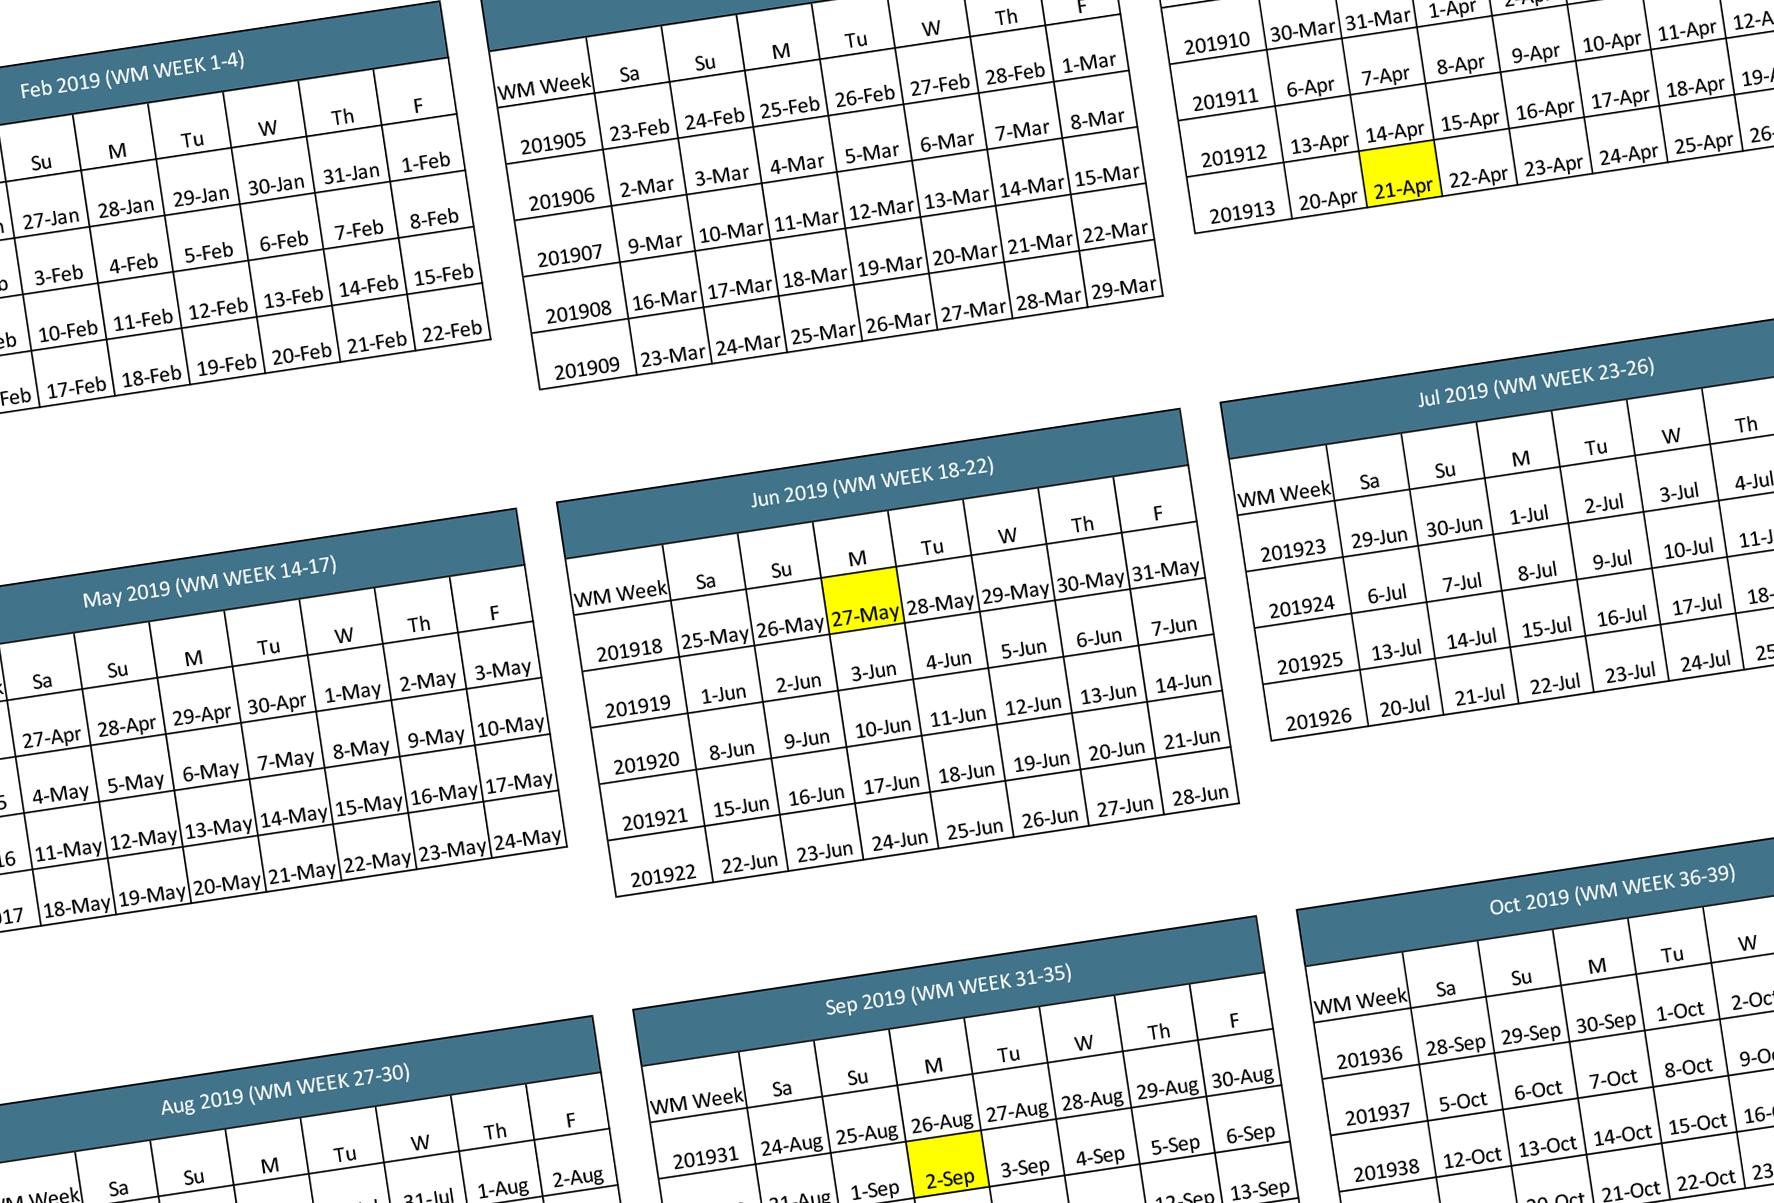 Walmart 2019-2020 Fiscal Calendar | Walmart Supplier News And Resources with regard to 2019-2020 Calendar Financial Week Numbers